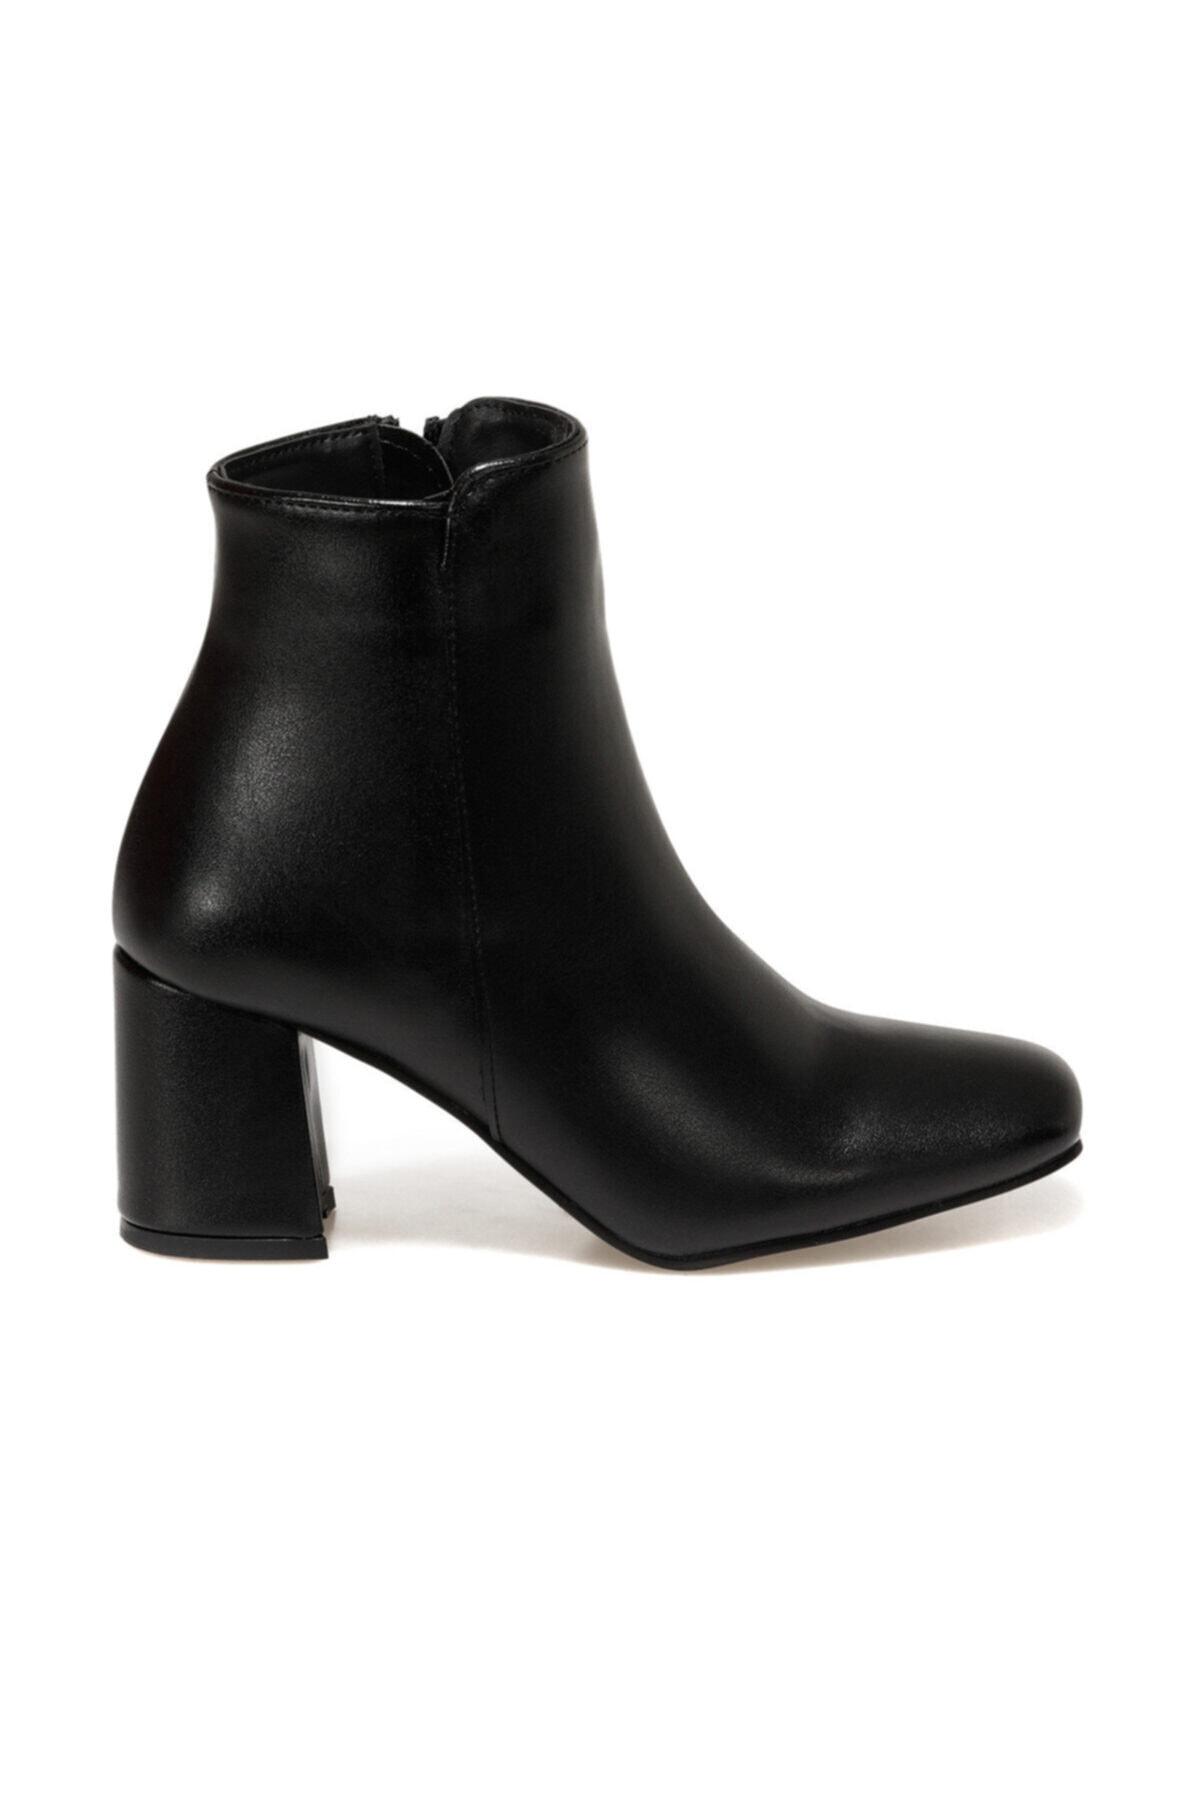 Butigo 20K-910 Siyah Kadın Topuklu Bot 100584632 1